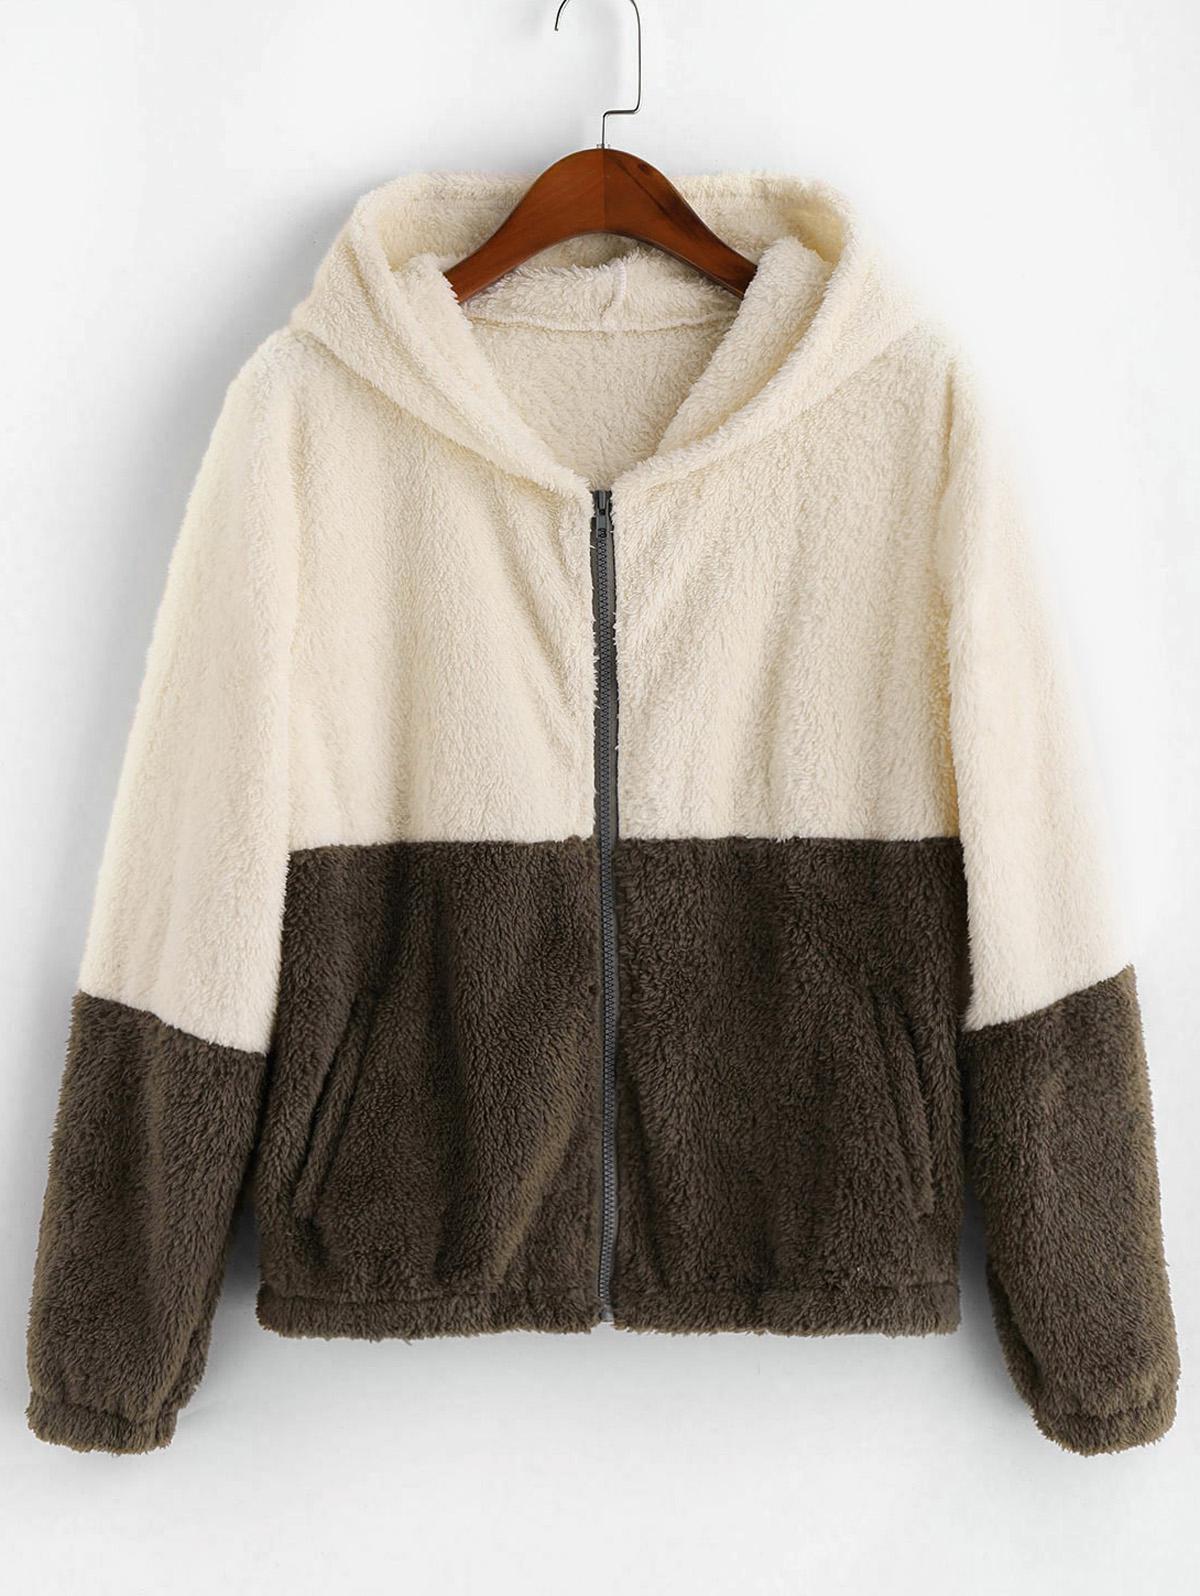 ZAFUL Zip Up Fluffy Faux Shearling Two Tone Jacket